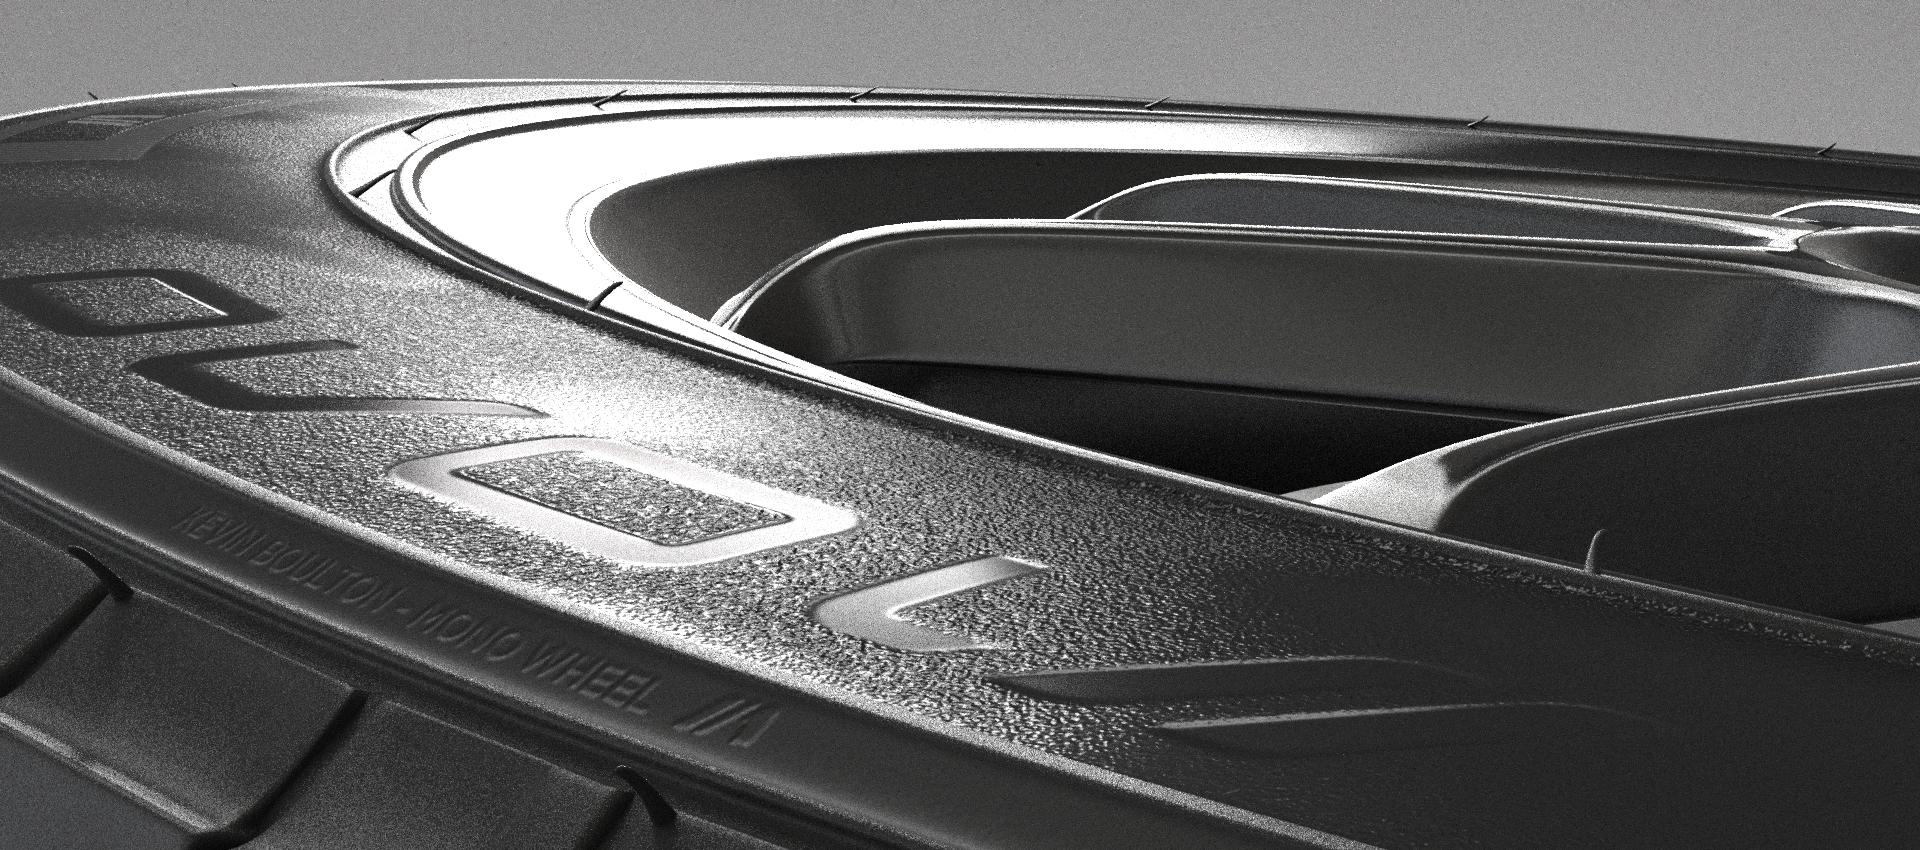 Bac Mono - Humster3D Car Comp 2016